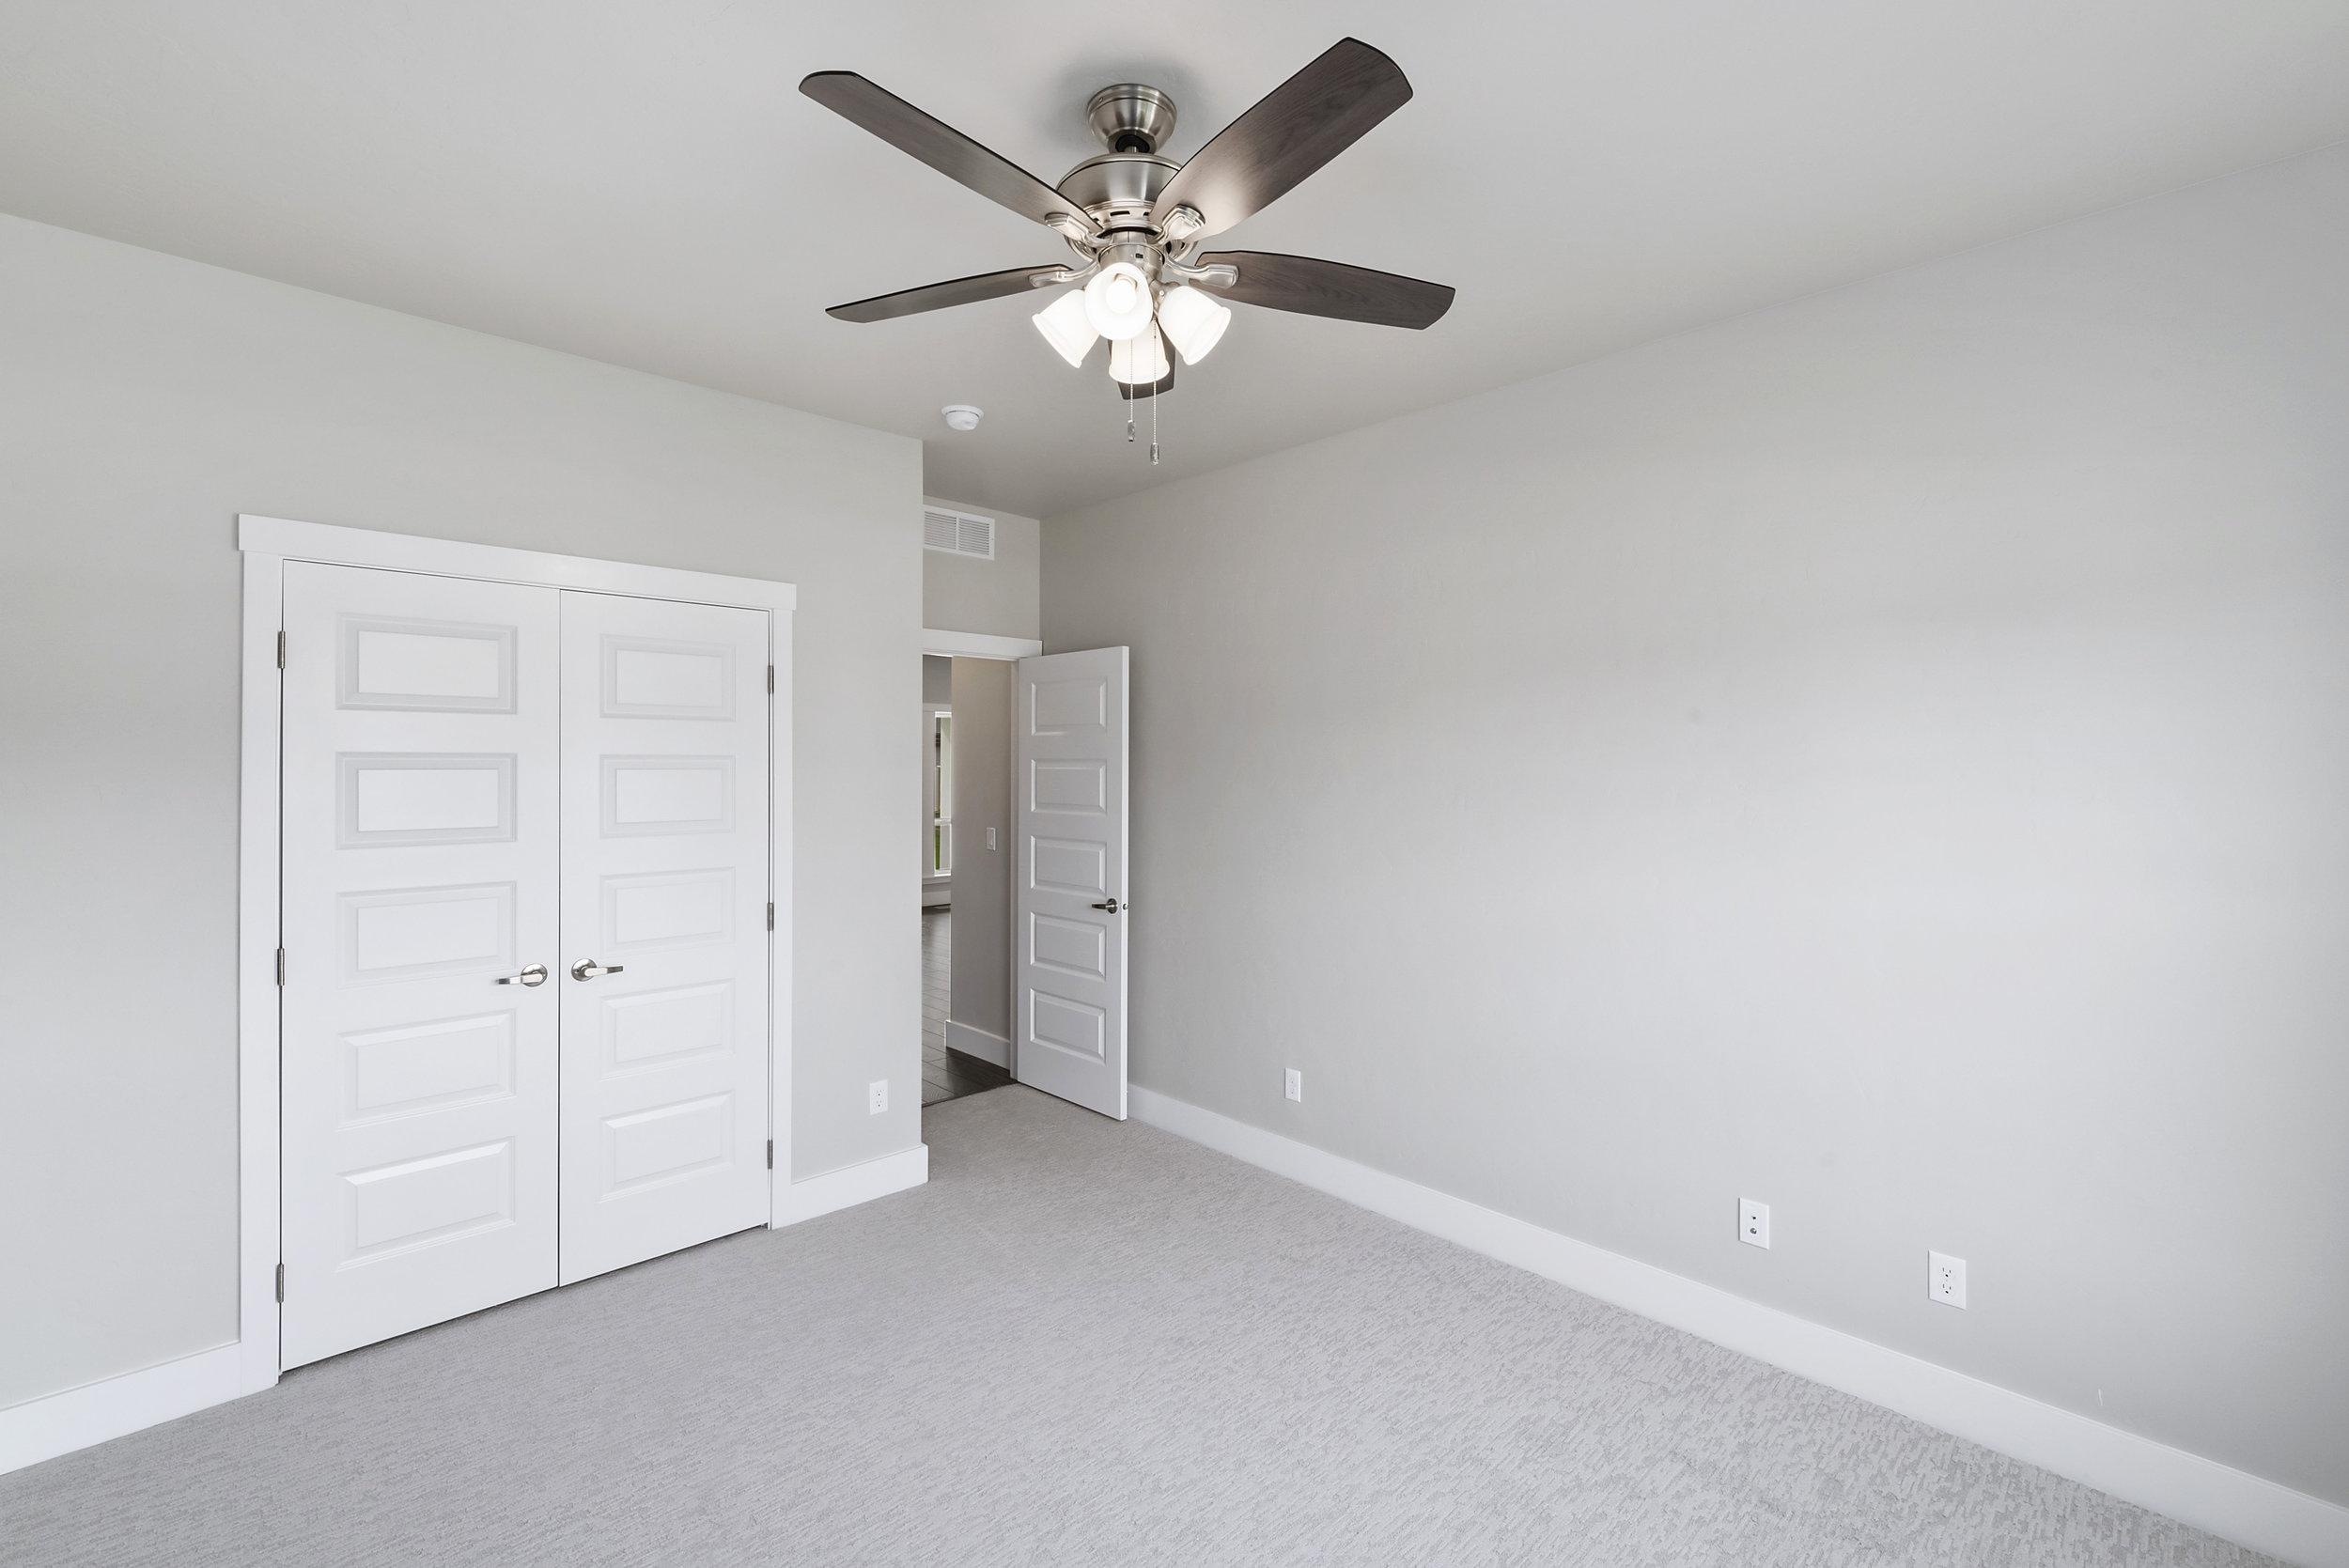 22-Bedroom.jpg